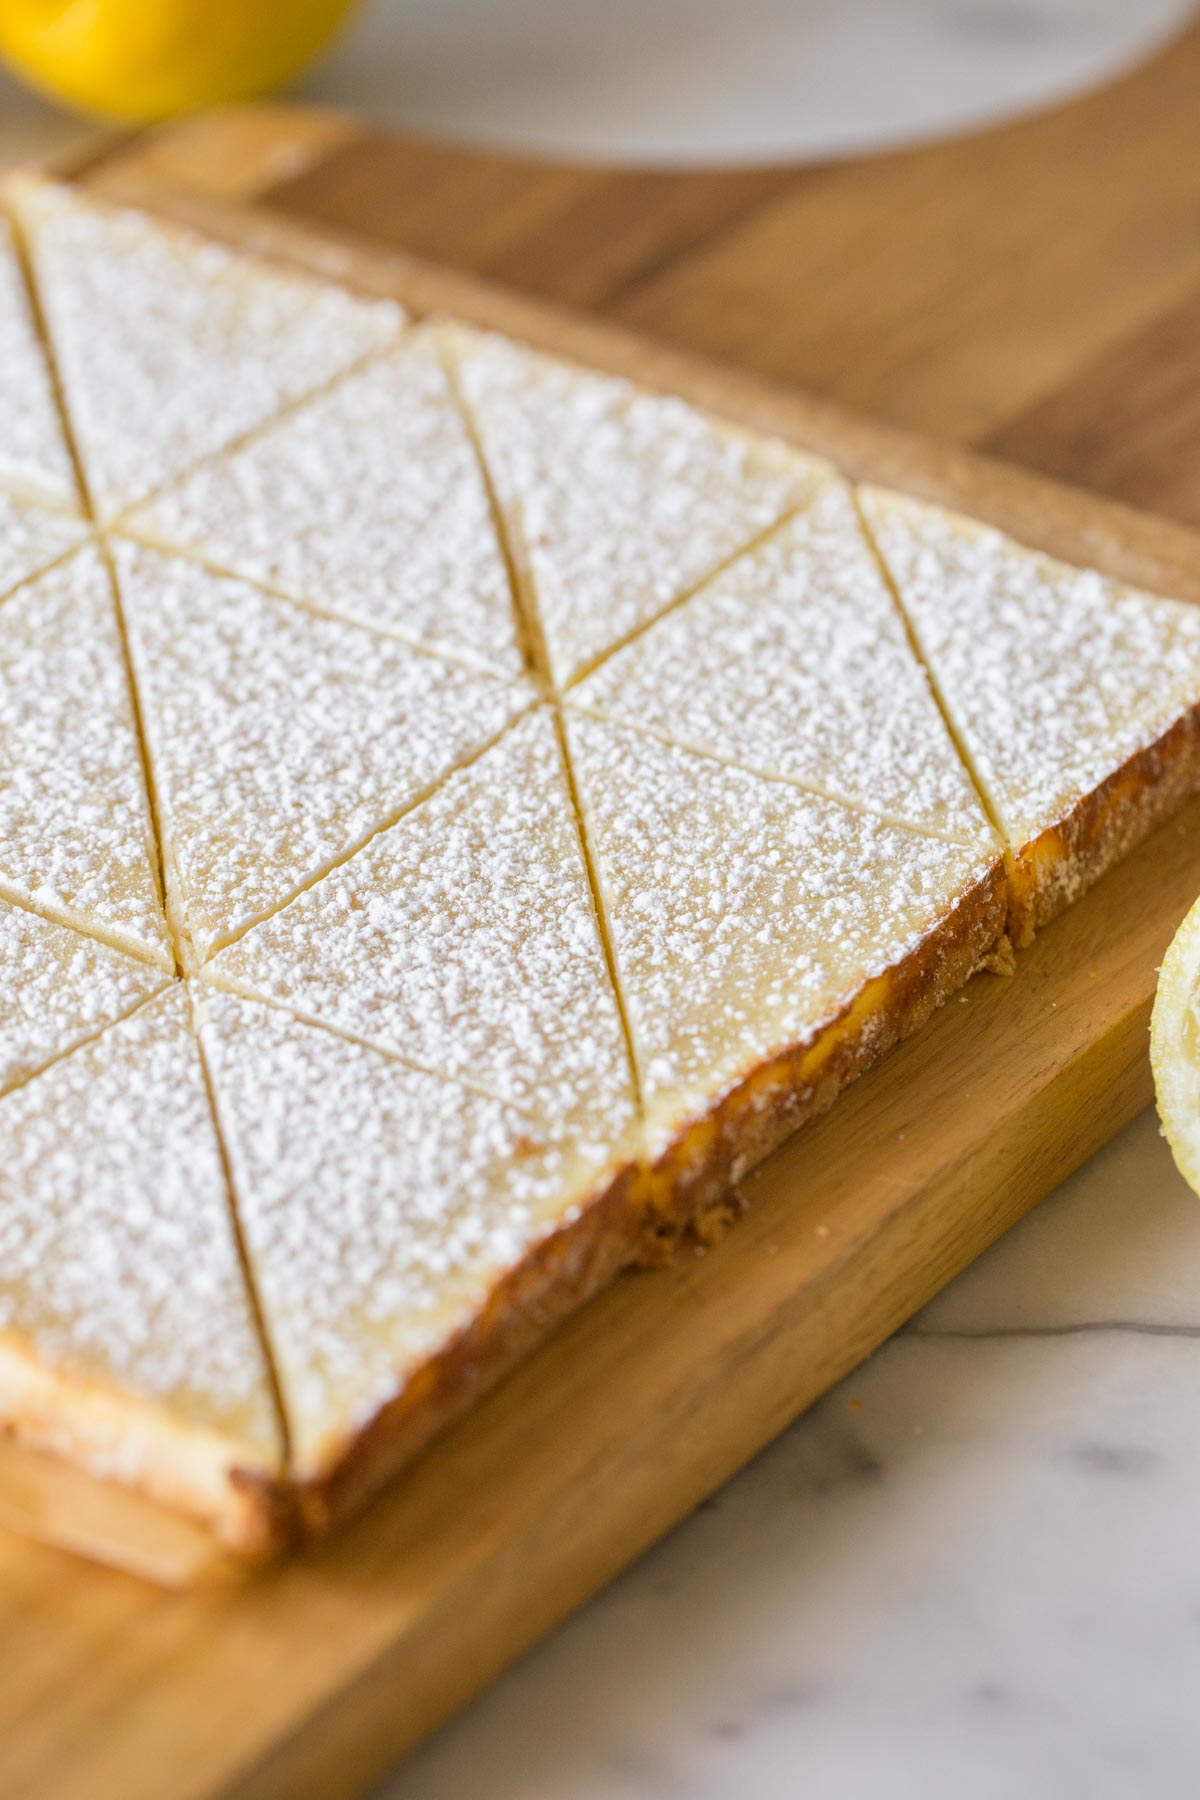 Swedish Lemon Bars on a wooden cutting board.